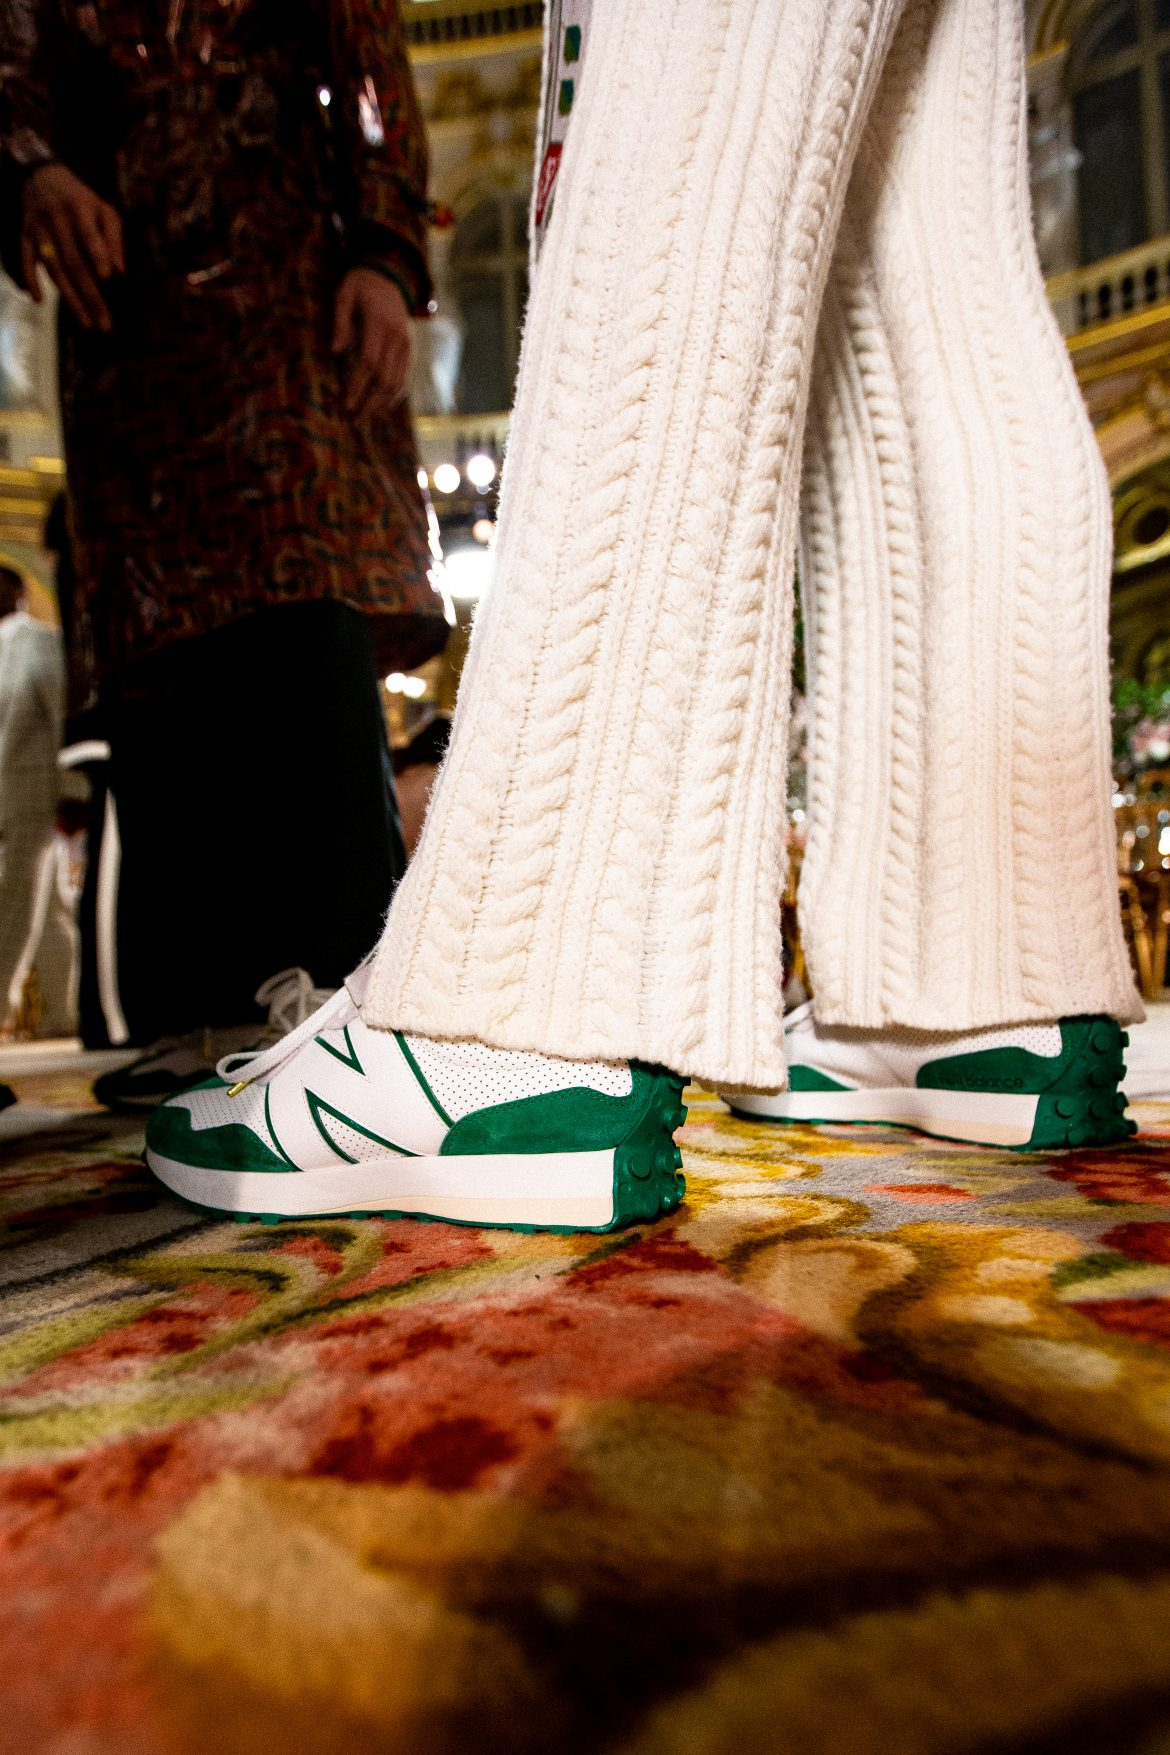 New Balance 327 Casablanca vert verte blanc beige crème A/W20 2020 PFW20